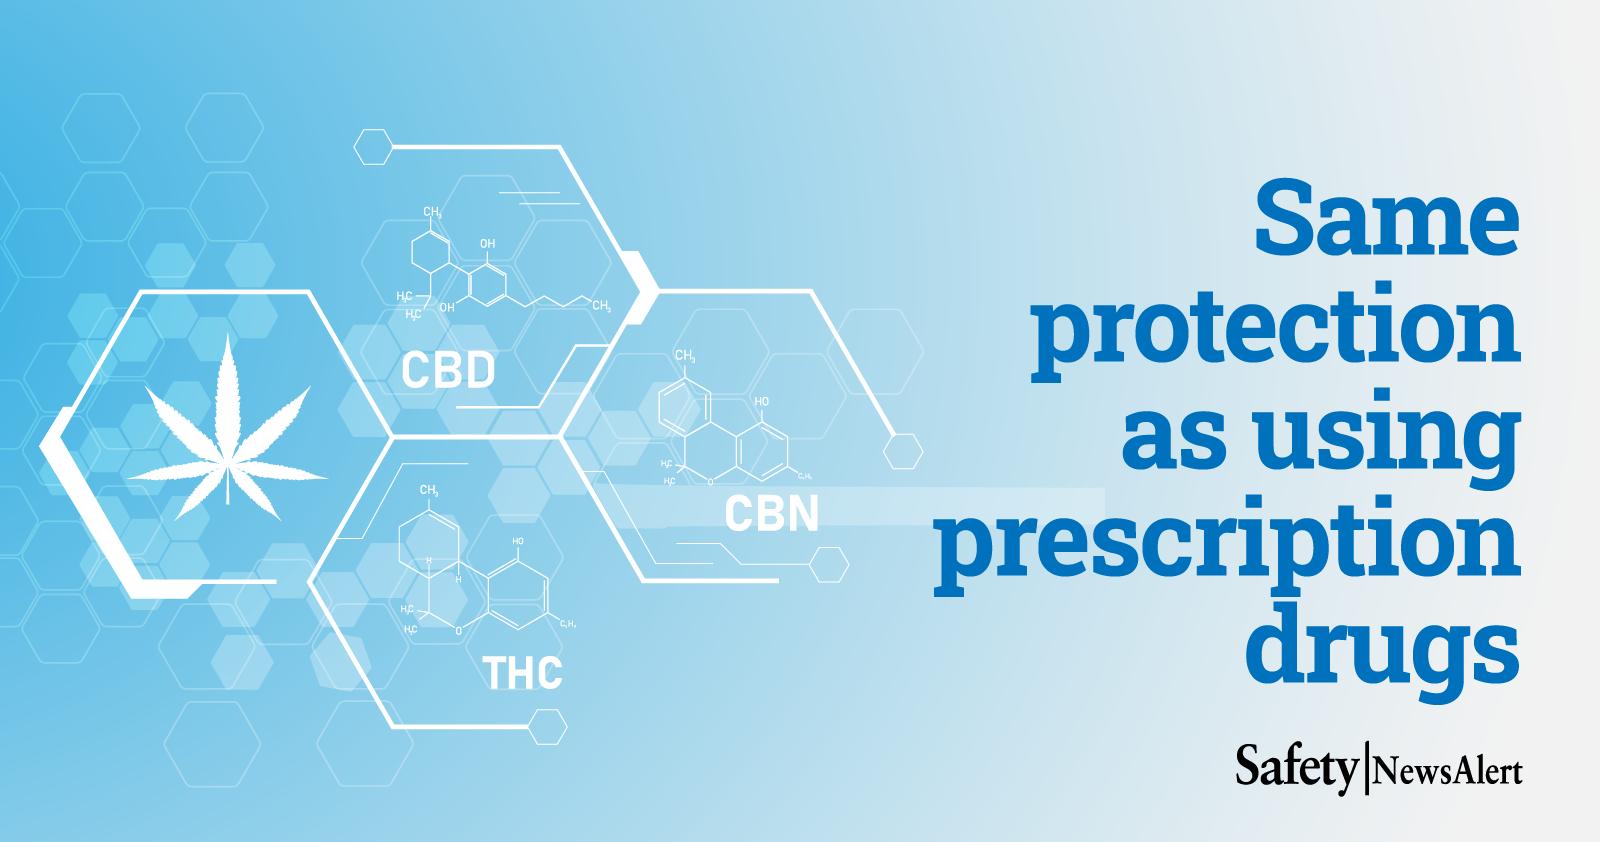 same protection as using prescription drugs